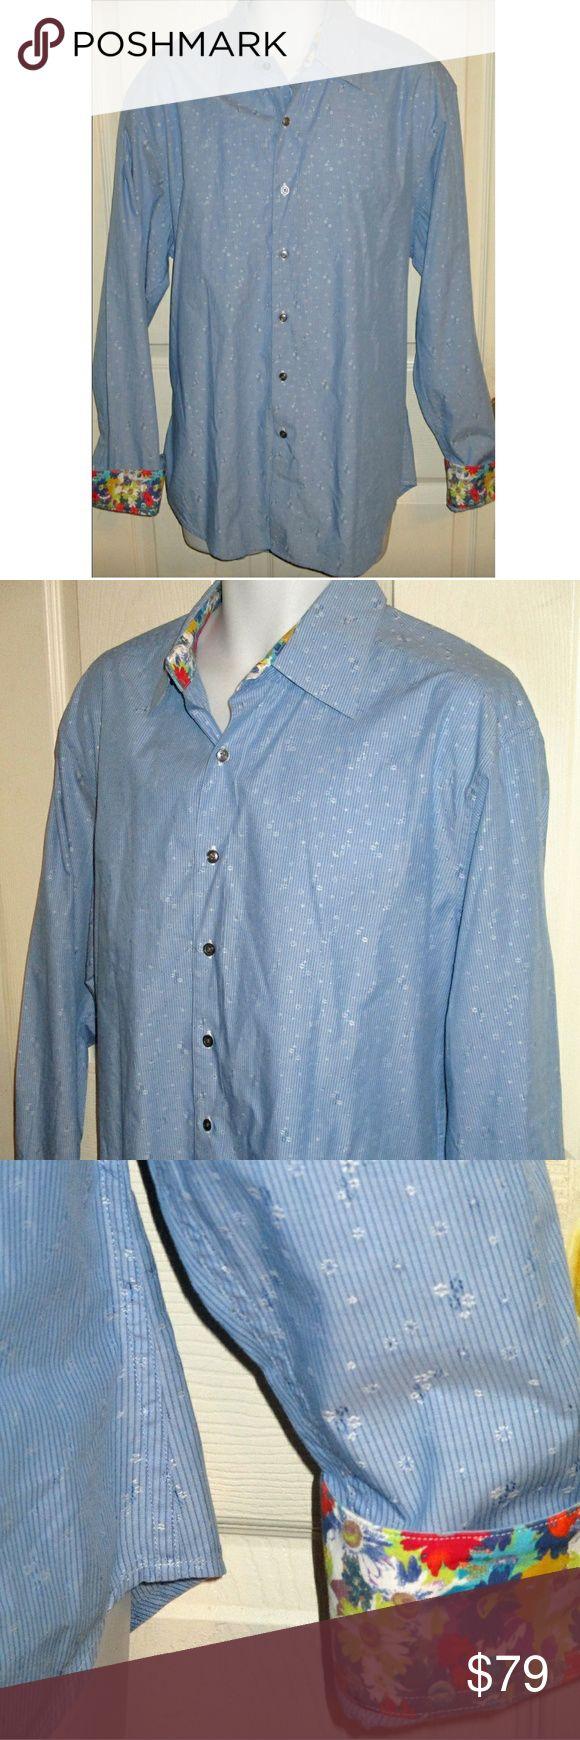 Robert Graham L/S Shirt Flip Cuff Silk Trim XL This is an XL long sleeve shirt with silk trim including flip collars by Robert Graham. The chest is 24 inches and length is 32 inches. Robert Graham Shirts Casual Button Down Shirts